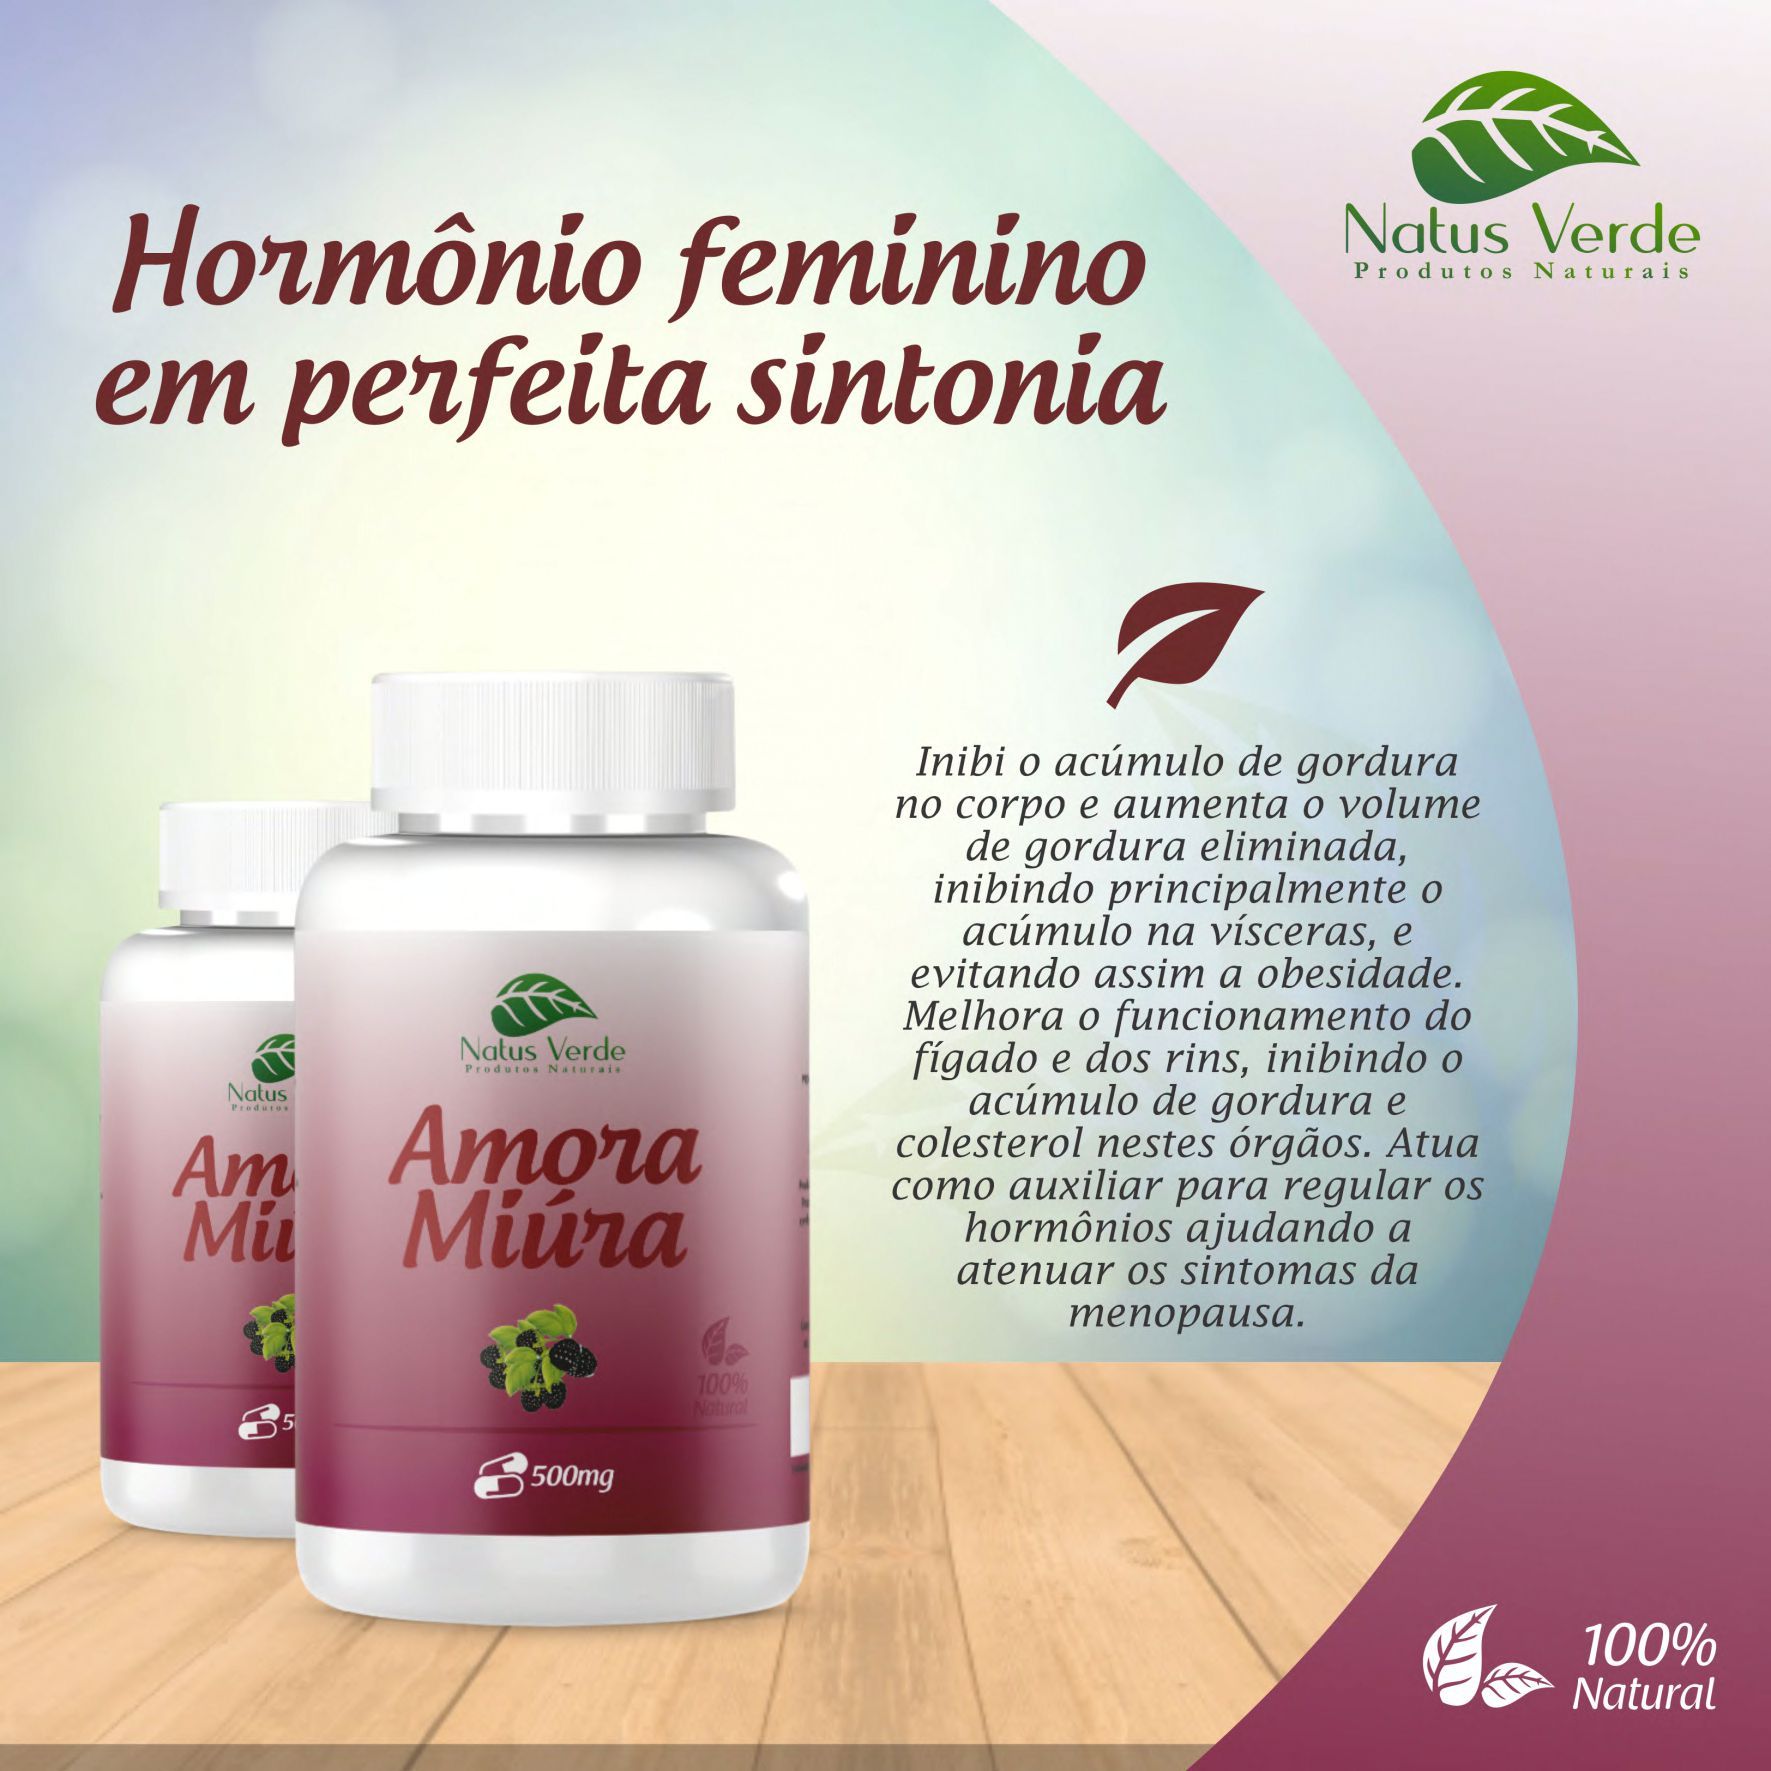 Composto Amora Miura 60 Caps Natus Verde  - Fribasex - Fabricasex.com